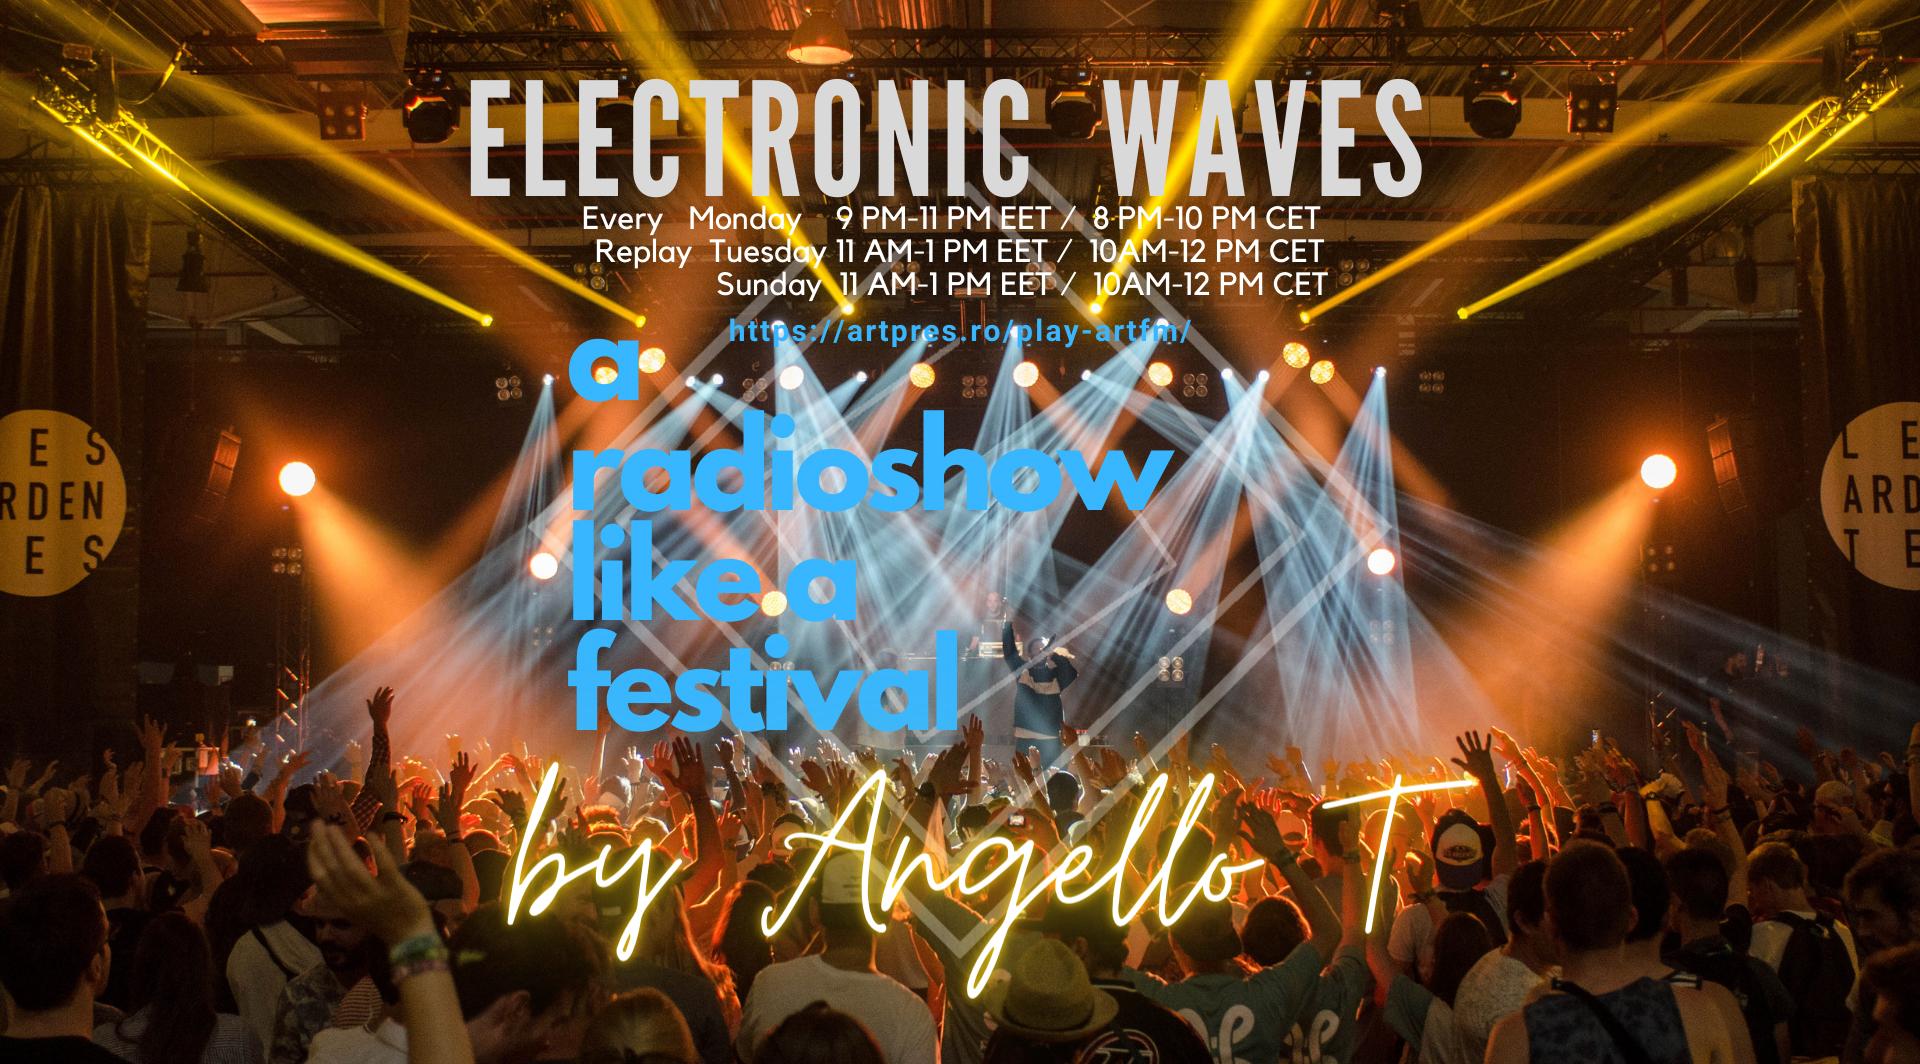 https://artpres.ro/wp-content/uploads/2021/04/electronic-waves-m.jpg